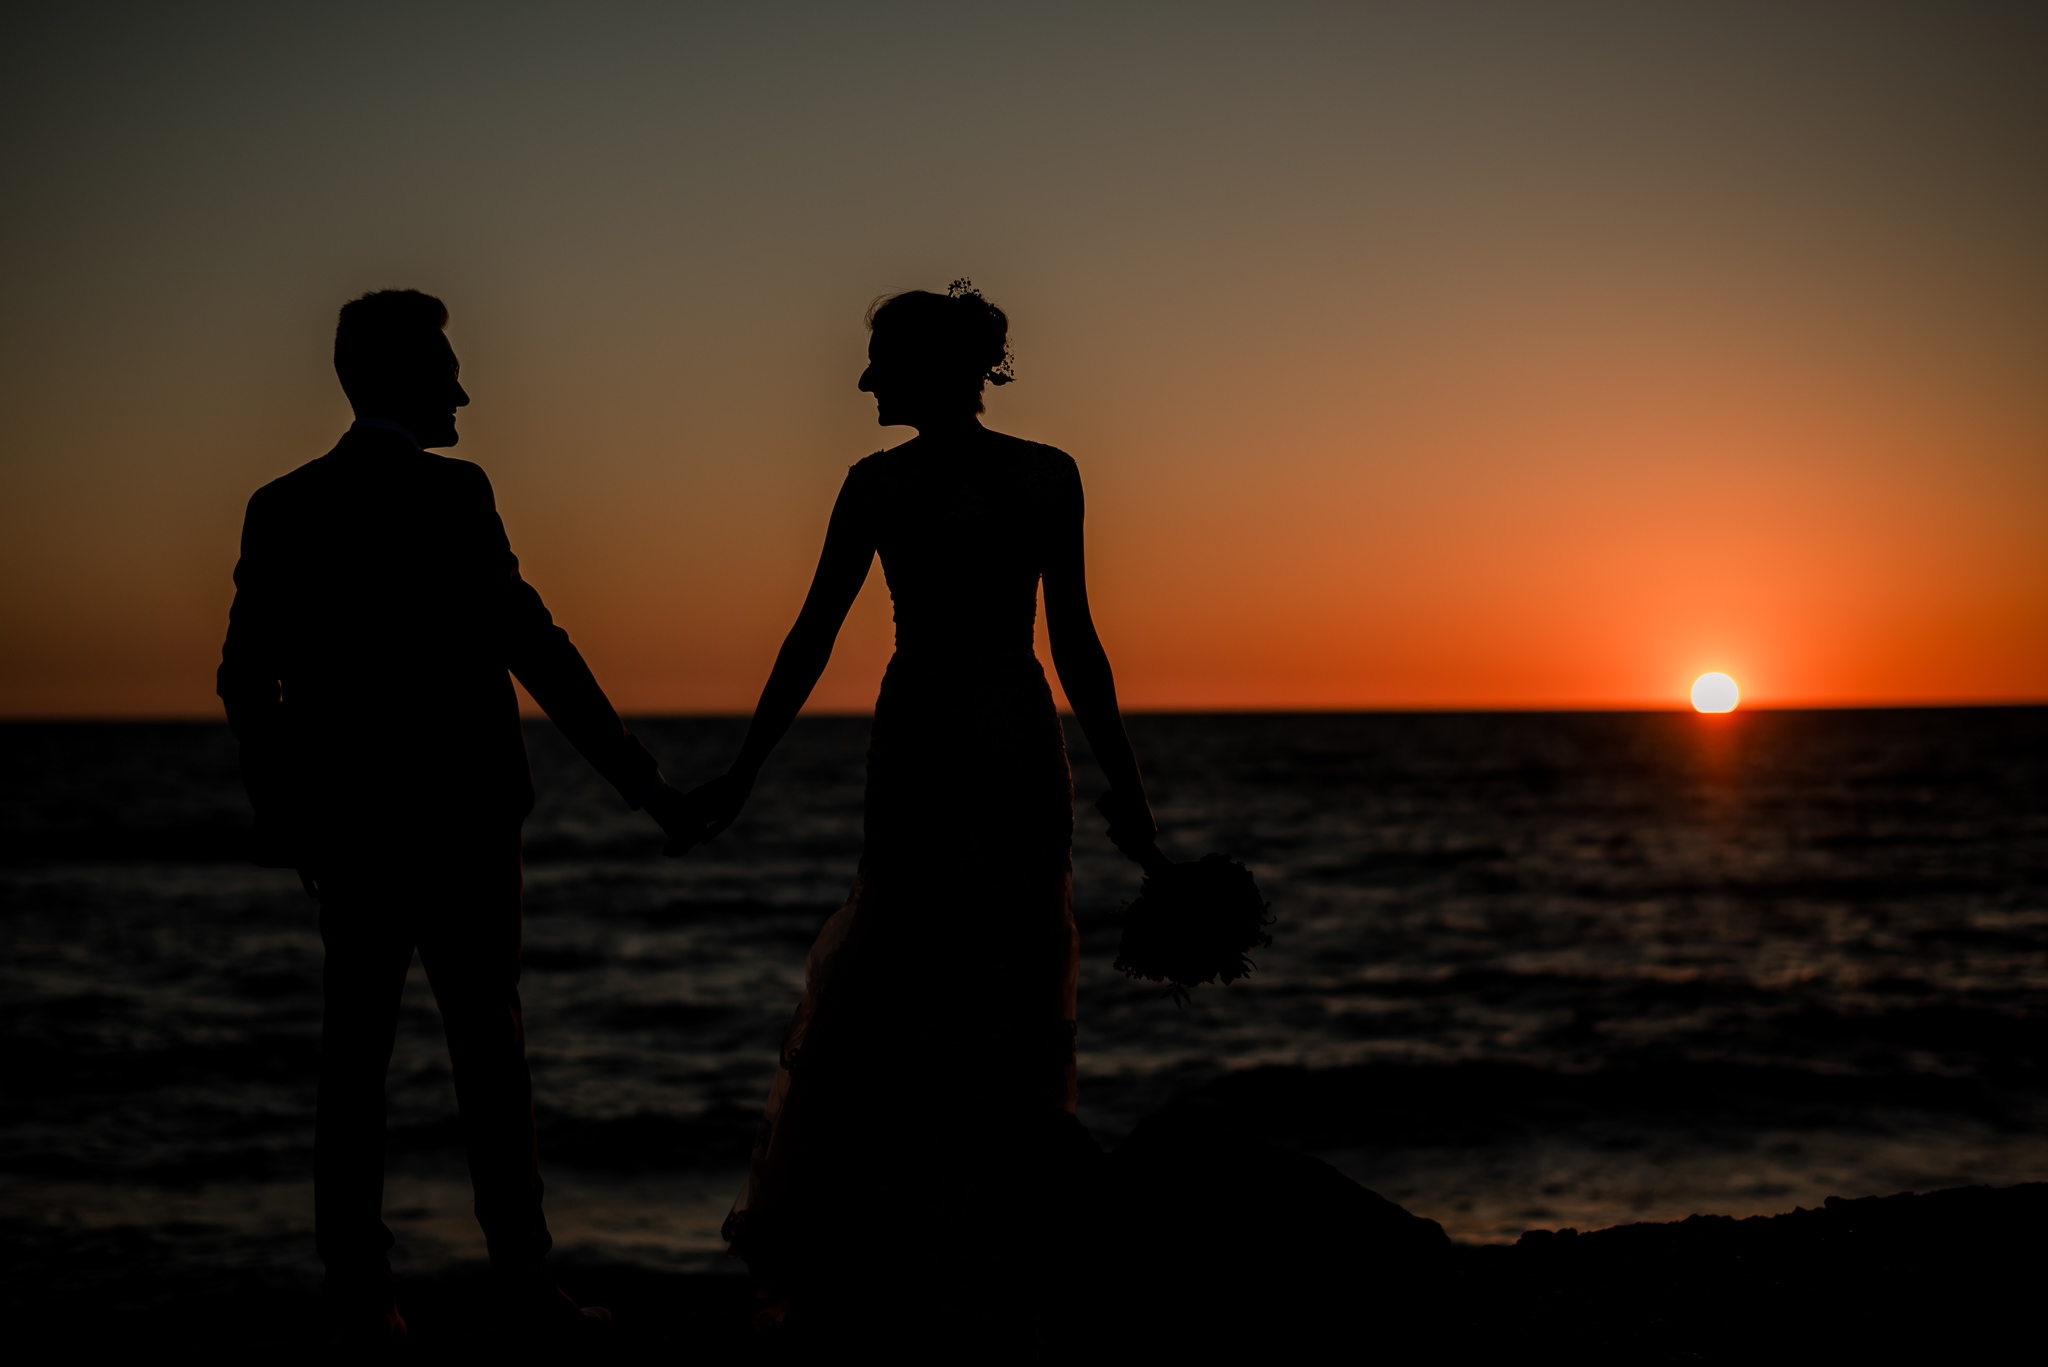 SARASOTA_WEDDING_PHOTOGRAPHY_SMMZ_6127.jpg